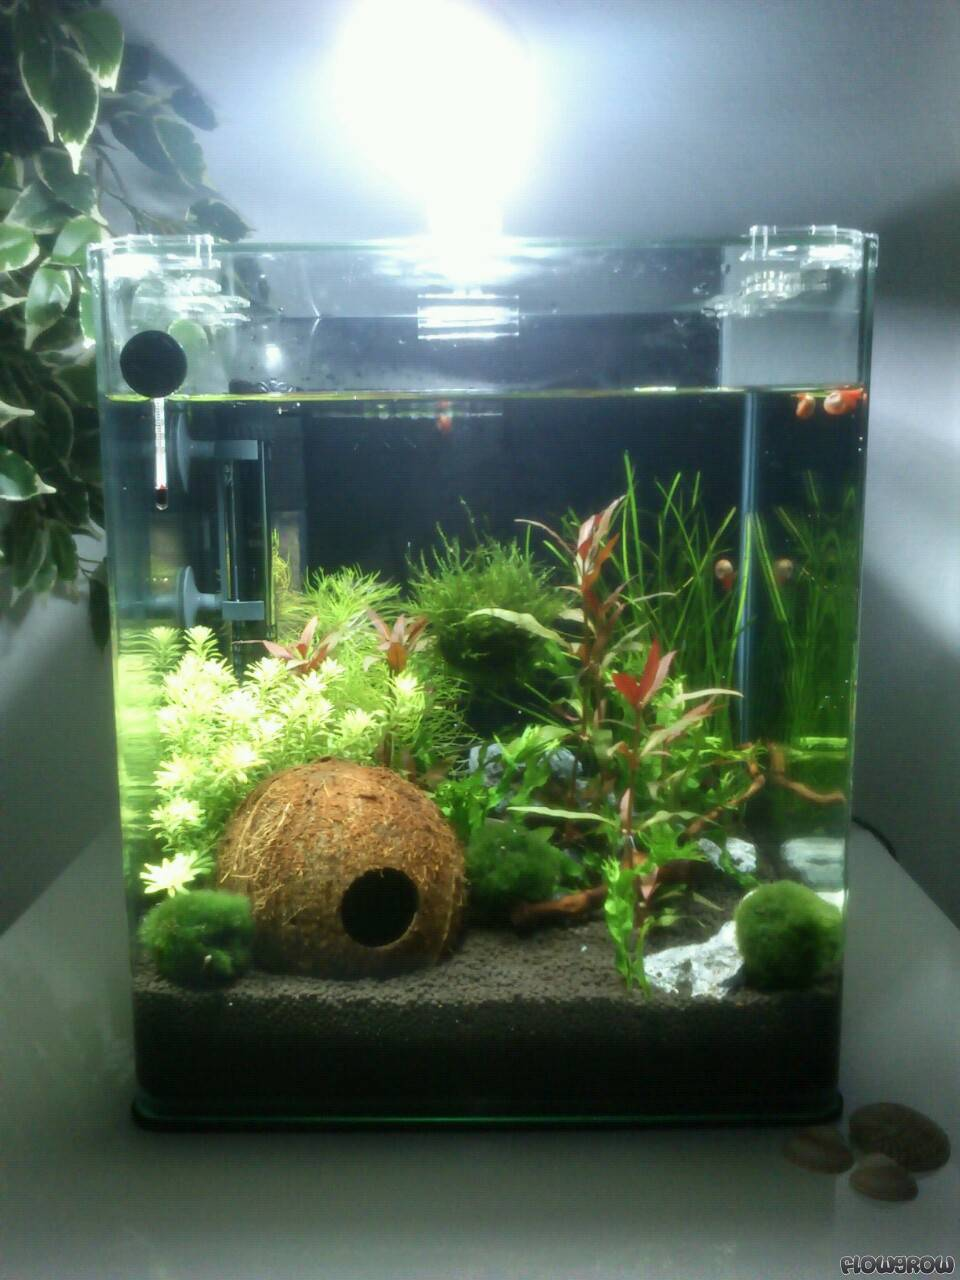 coconut hideout 30 liter cube flowgrow aquascape aquarien datenbank. Black Bedroom Furniture Sets. Home Design Ideas